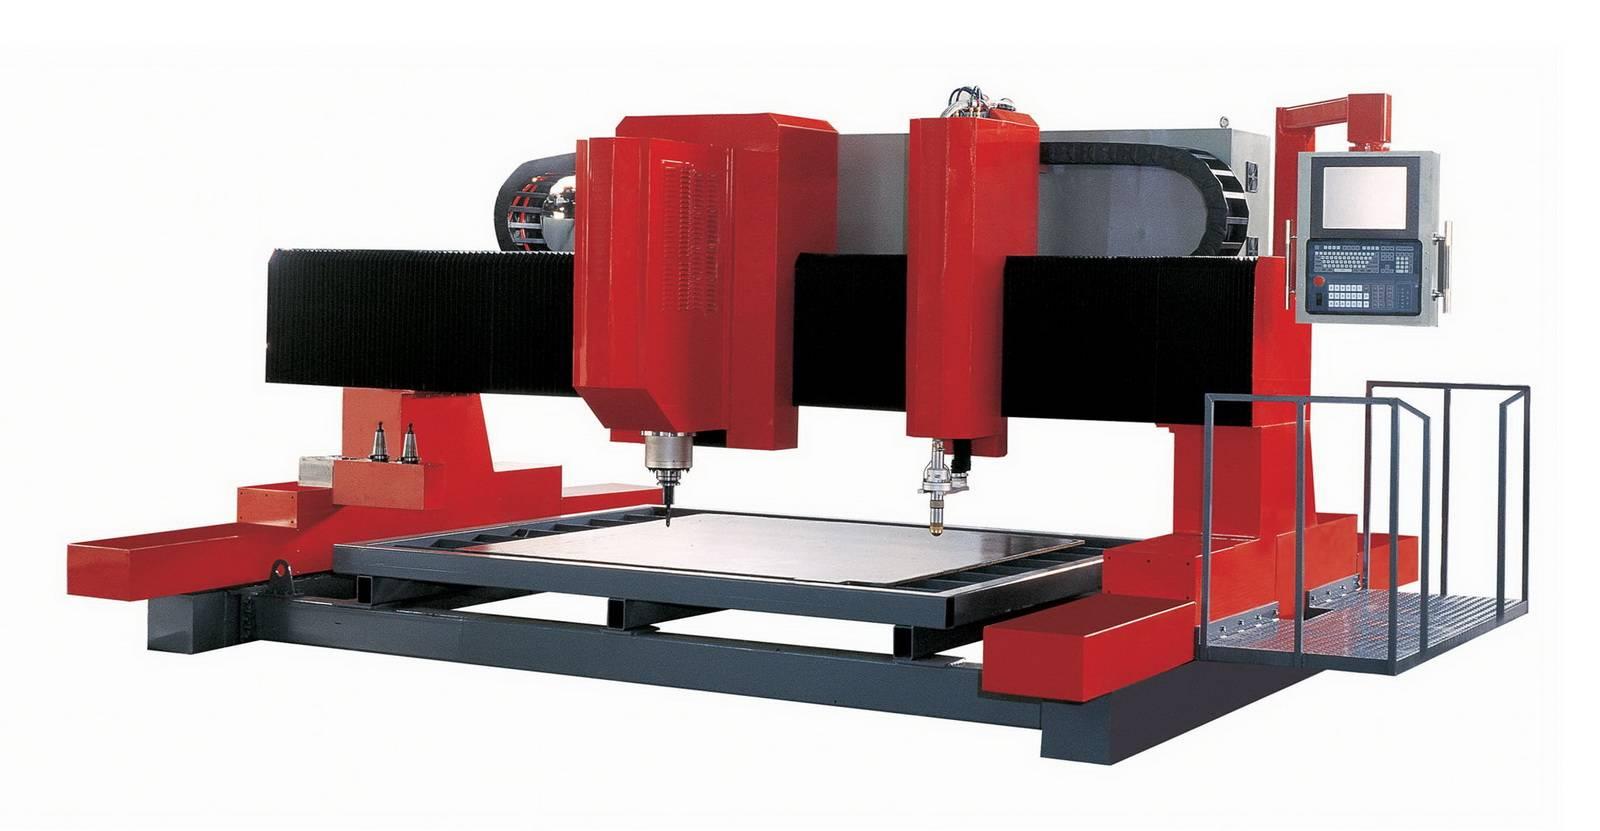 CNC Drilling Milling & Cutting Machine